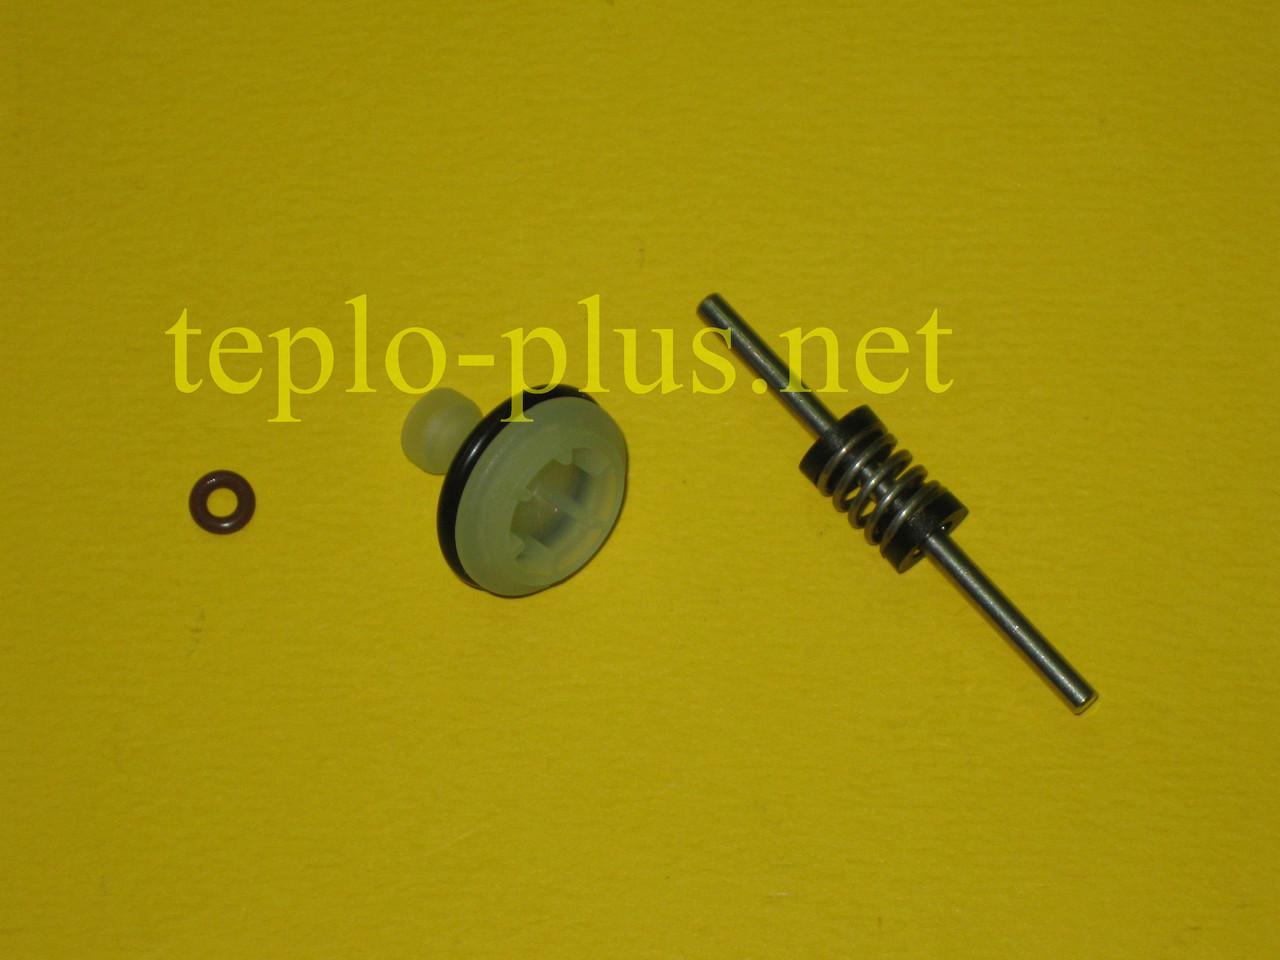 Шток трехходового клапана 0020118778 (3003202760) Protherm Lynx HK, Ягуар (Jaguar), Гепард (Gepard) , фото 2